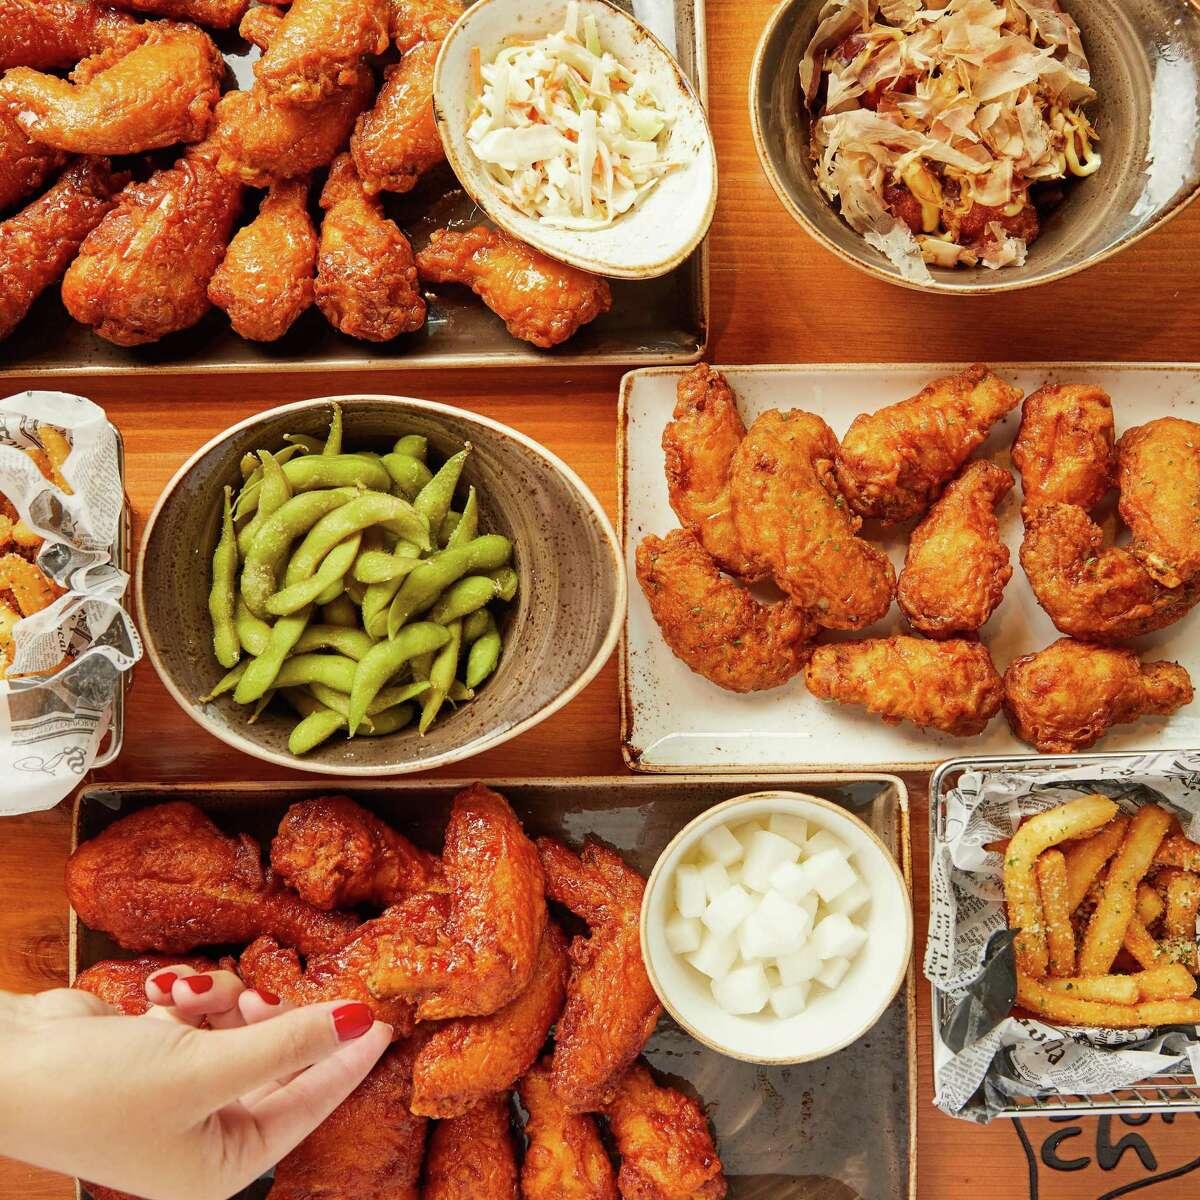 Korean fried chicken brand Bonchon is now open at 2100 Travis St. in Midtown.